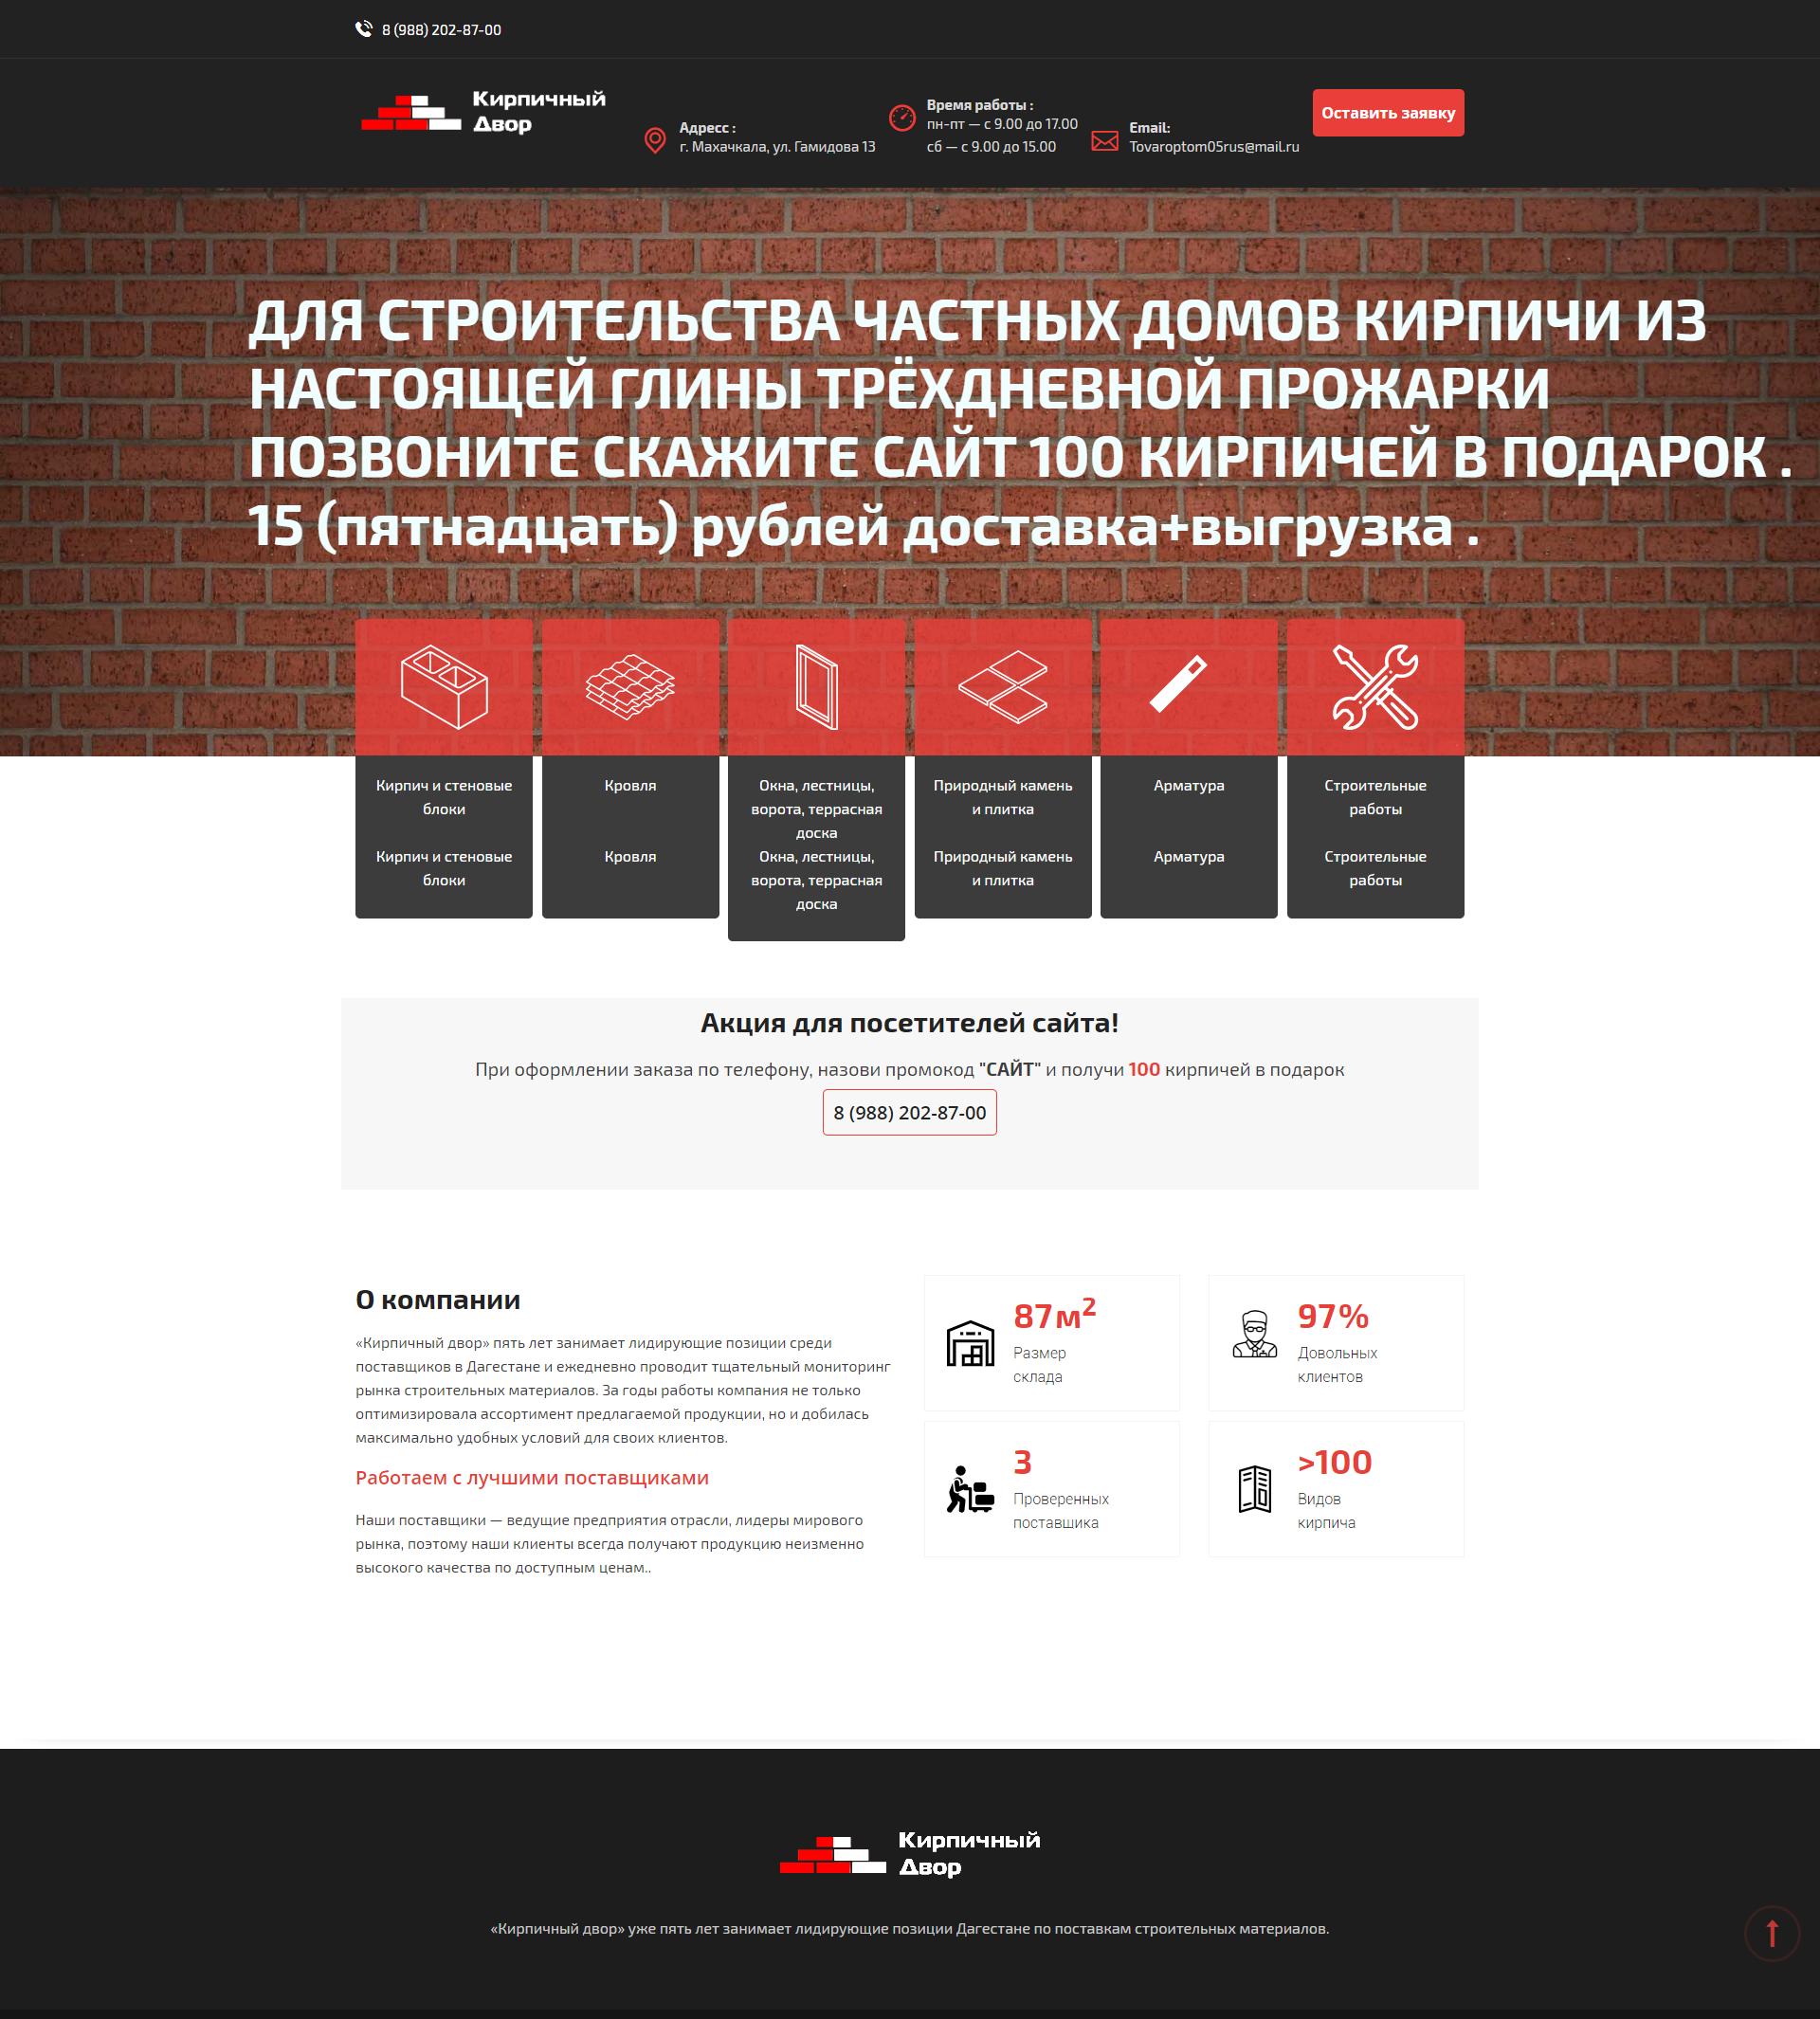 Кирпичный двор - сайт по продаже кирпича